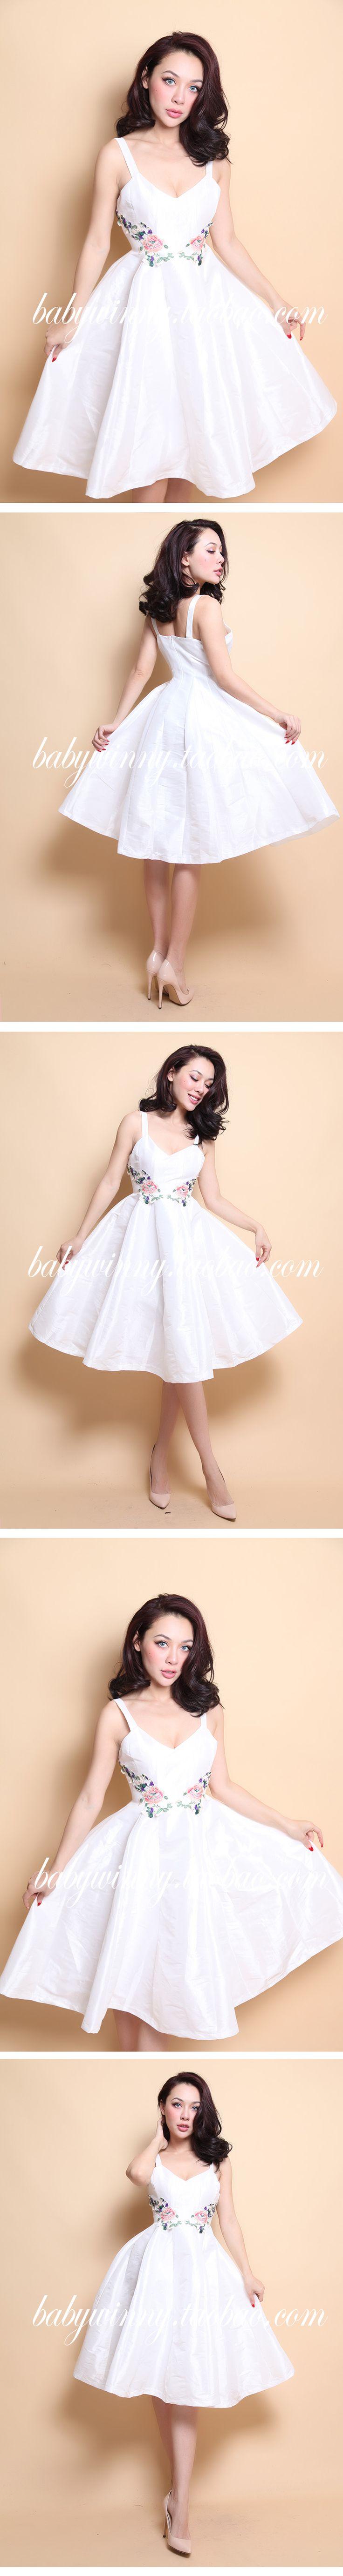 best womenus clothes images on pinterest